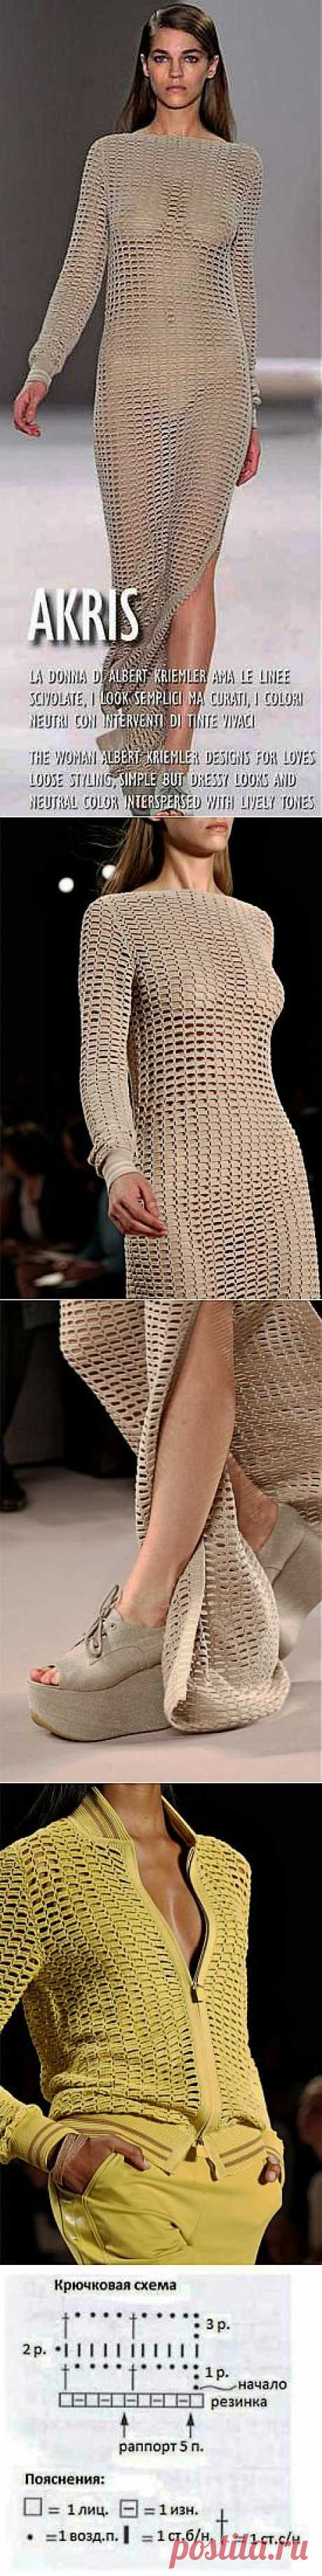 Knitting from Akris.